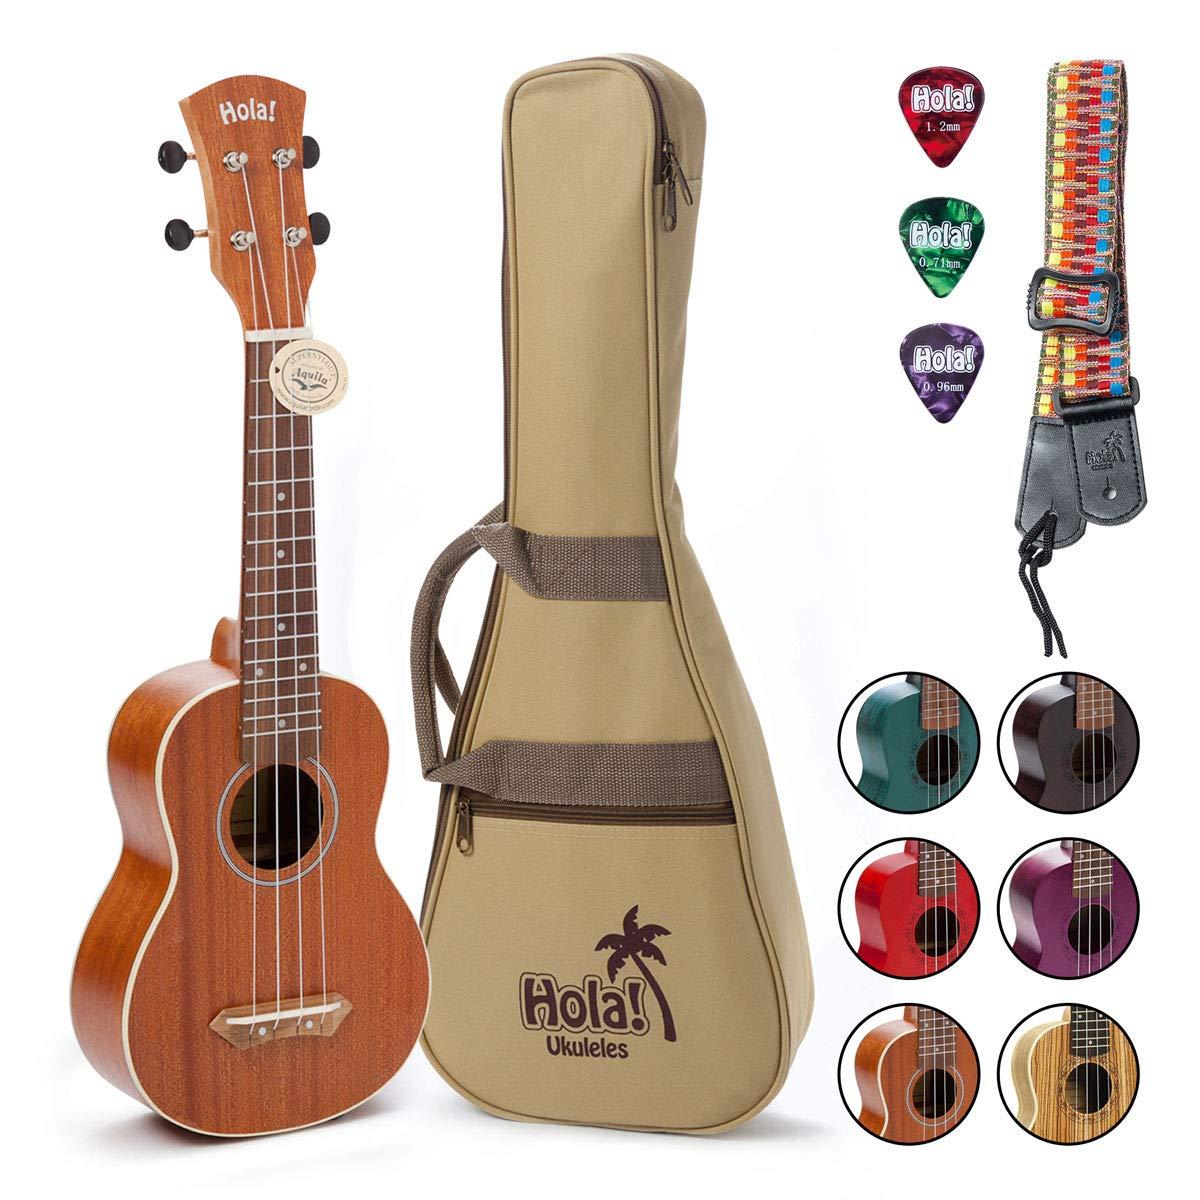 Hola! Music HM-121MG+ Deluxe Mahogany Soprano Ukulele Bundle with Aquila Strings, Padded Gig Bag, Strap and Picks, Natural by Hola! Music